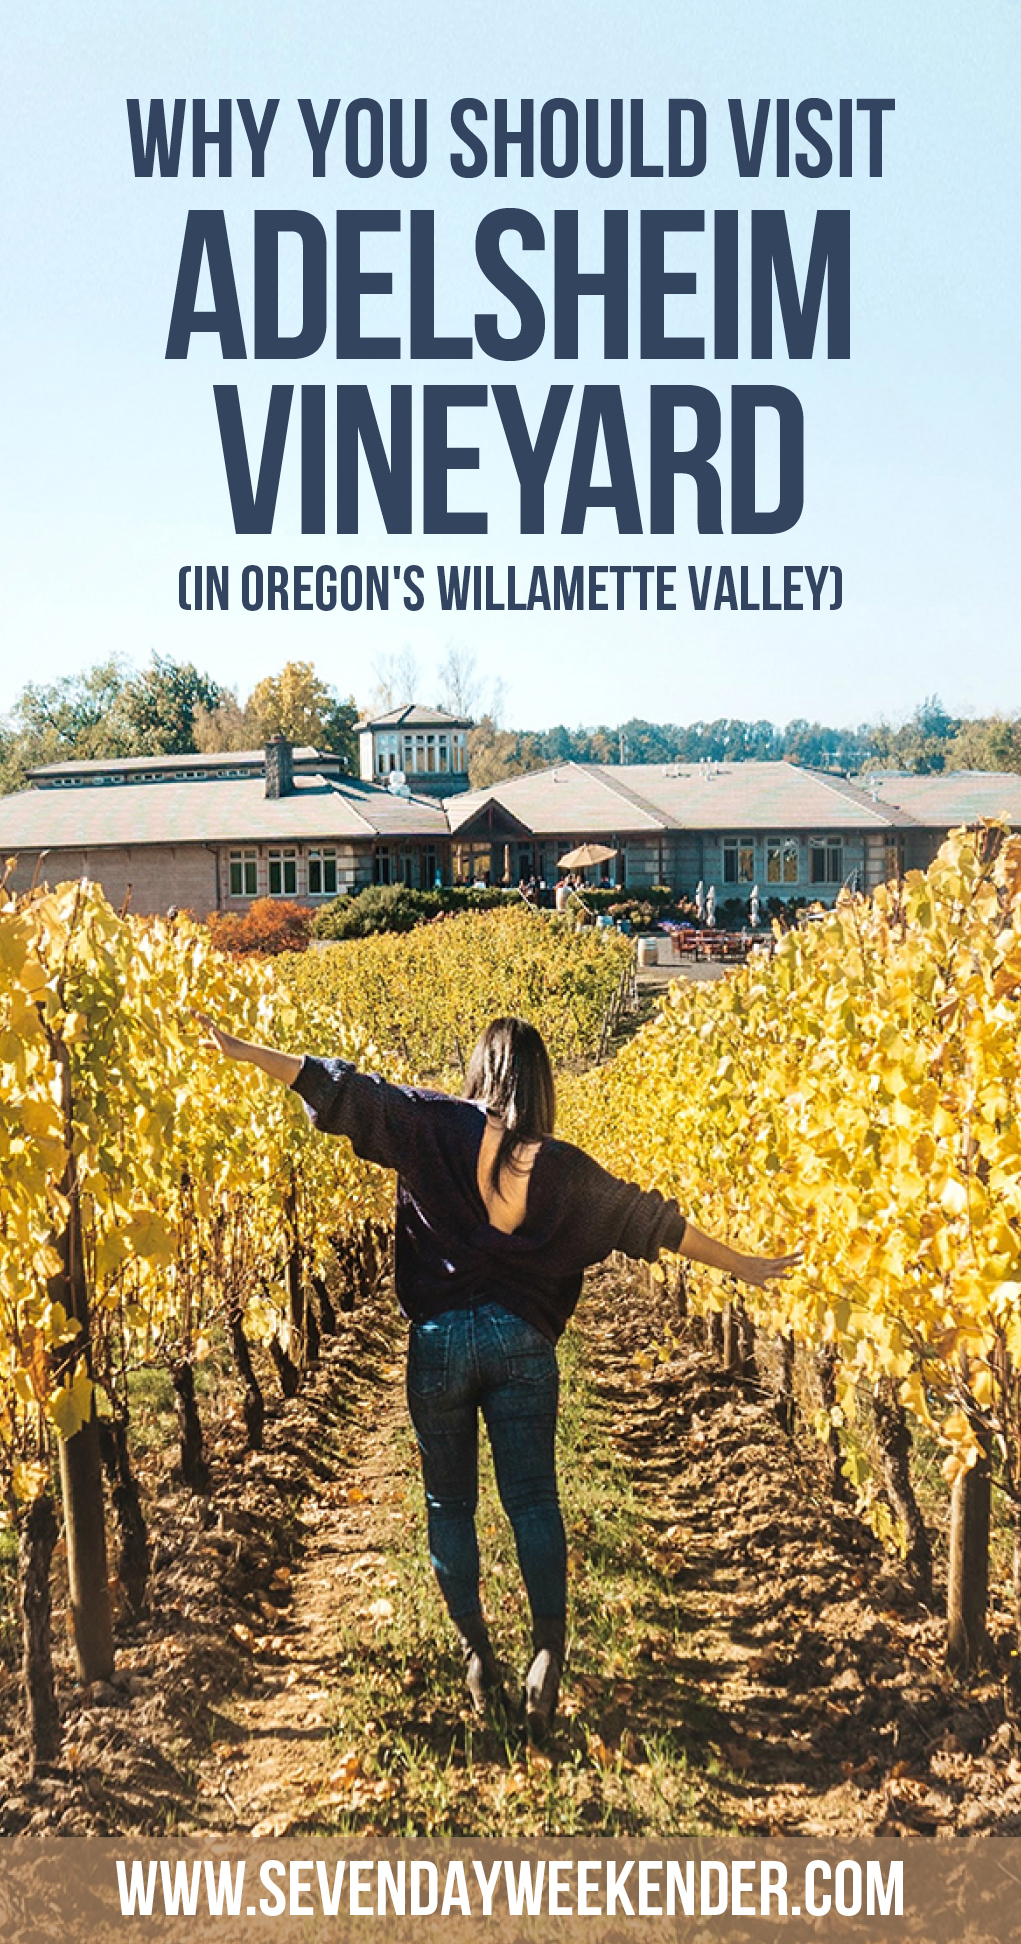 Why You Should Visit Adelsheim Vineyard